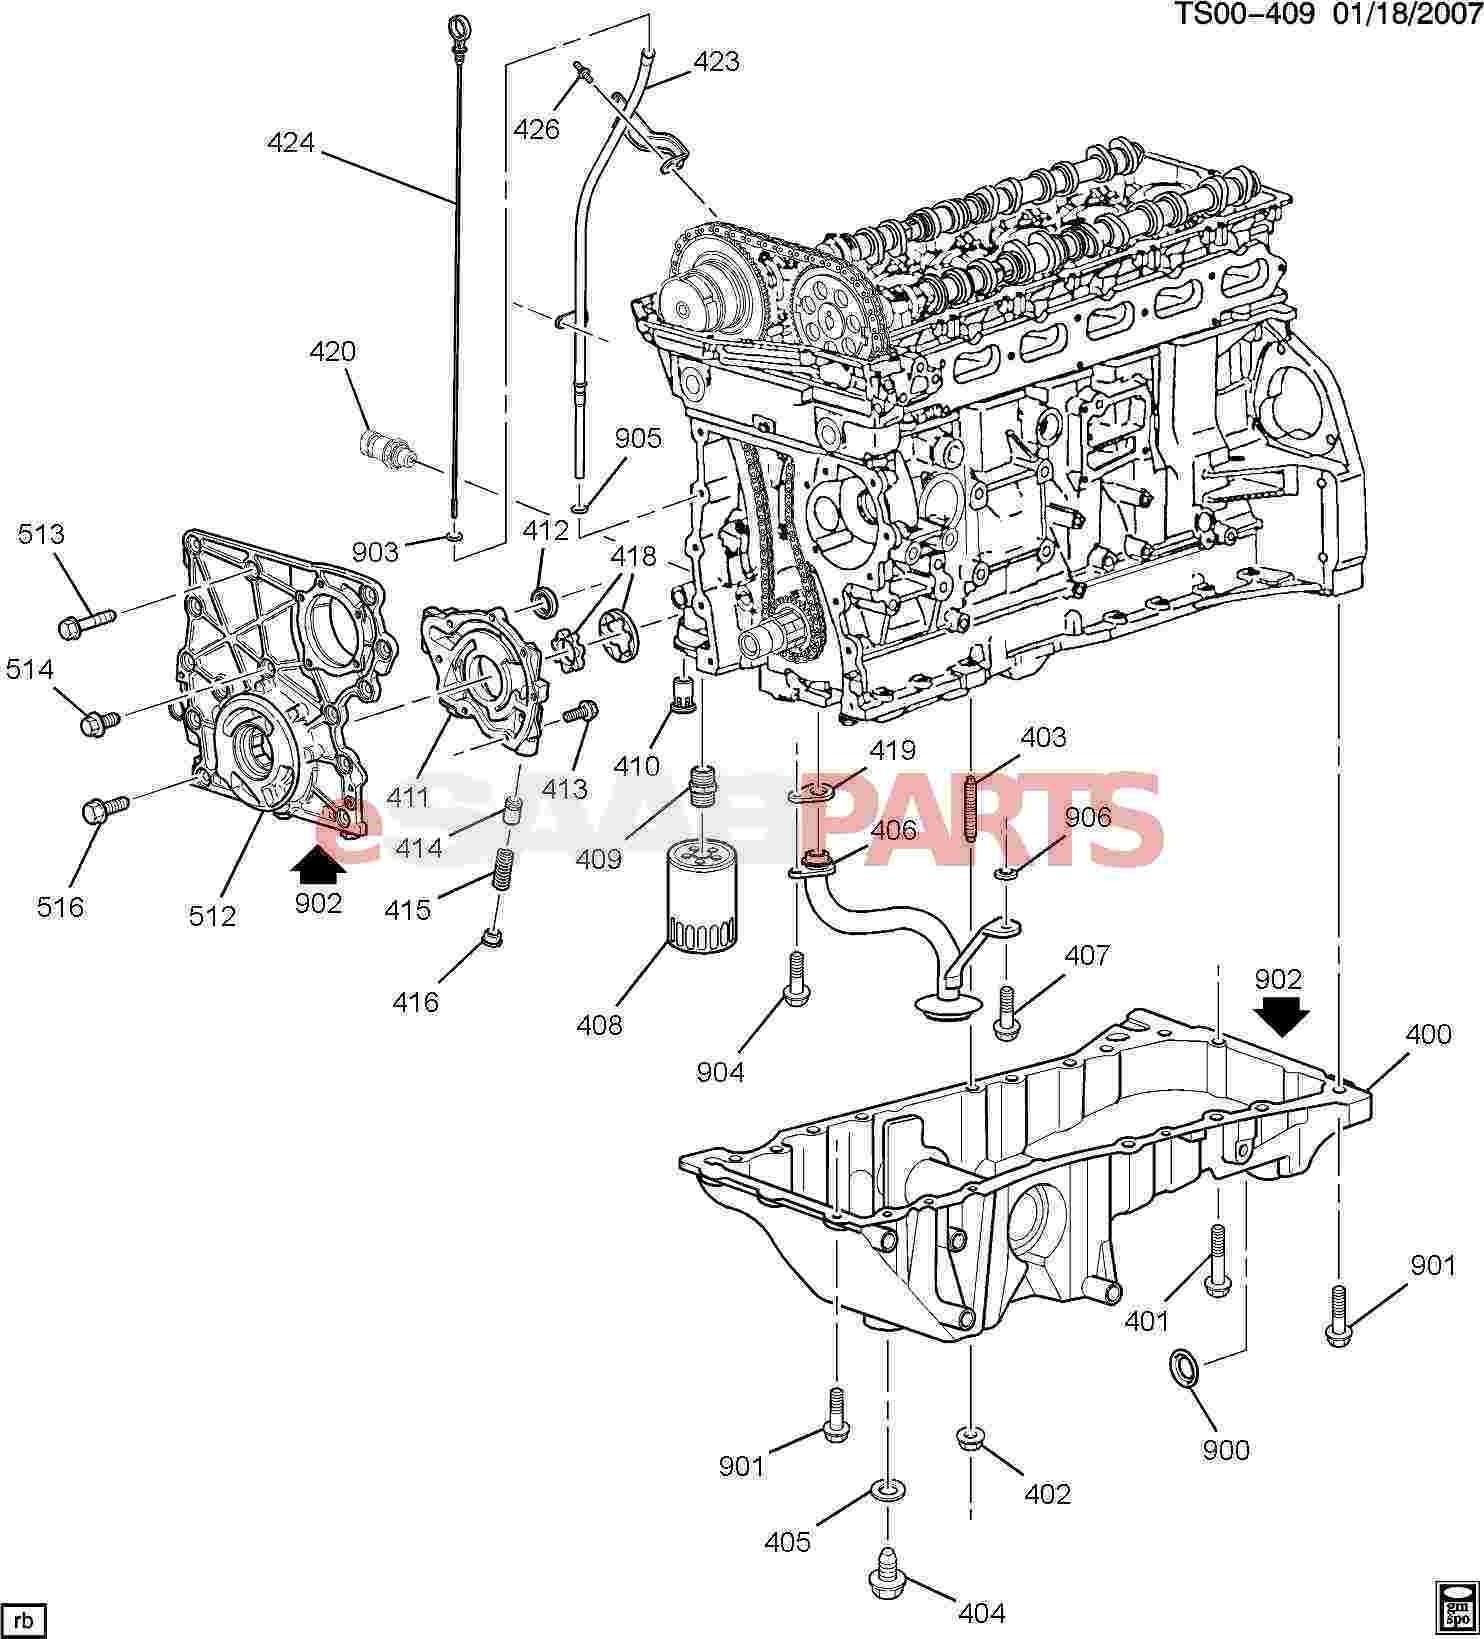 hight resolution of engine oil system diagram esaabparts saab 9 7x engine parts engine internal 4 2s of engine